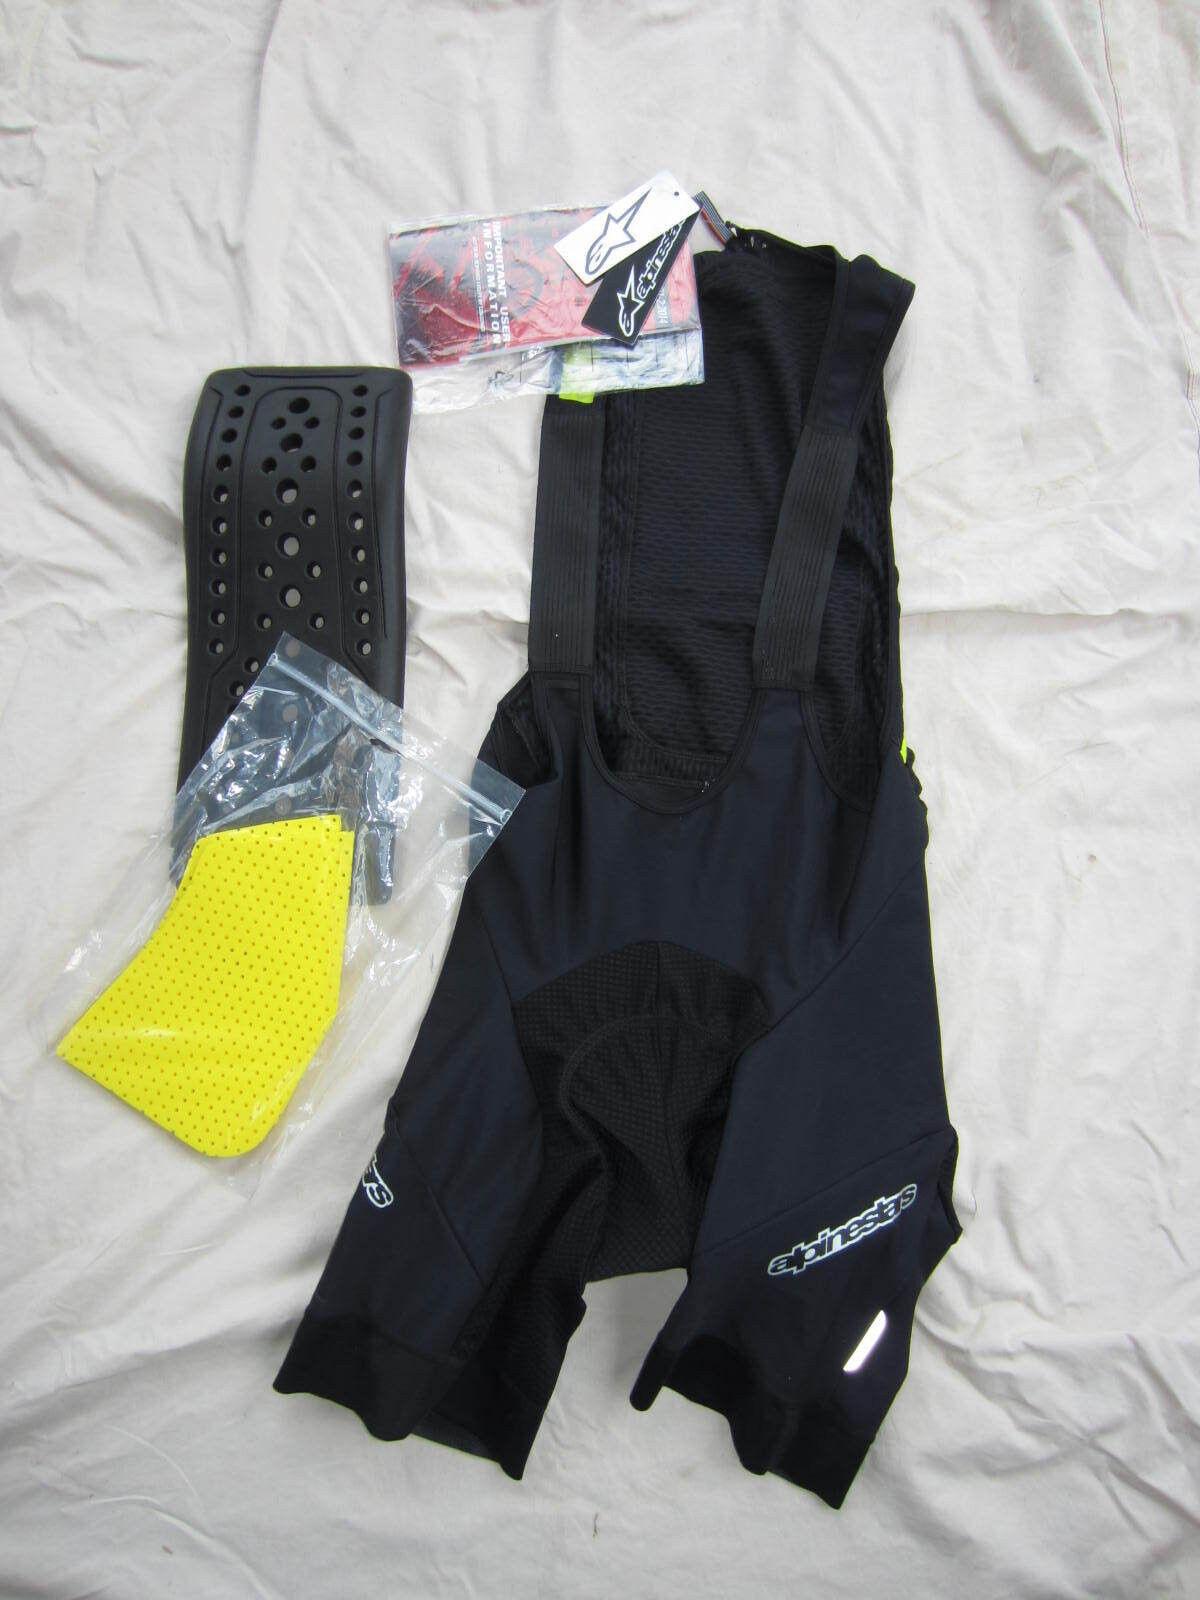 NEW - AlpineStars Paragon Predective Bib Shorts, XL